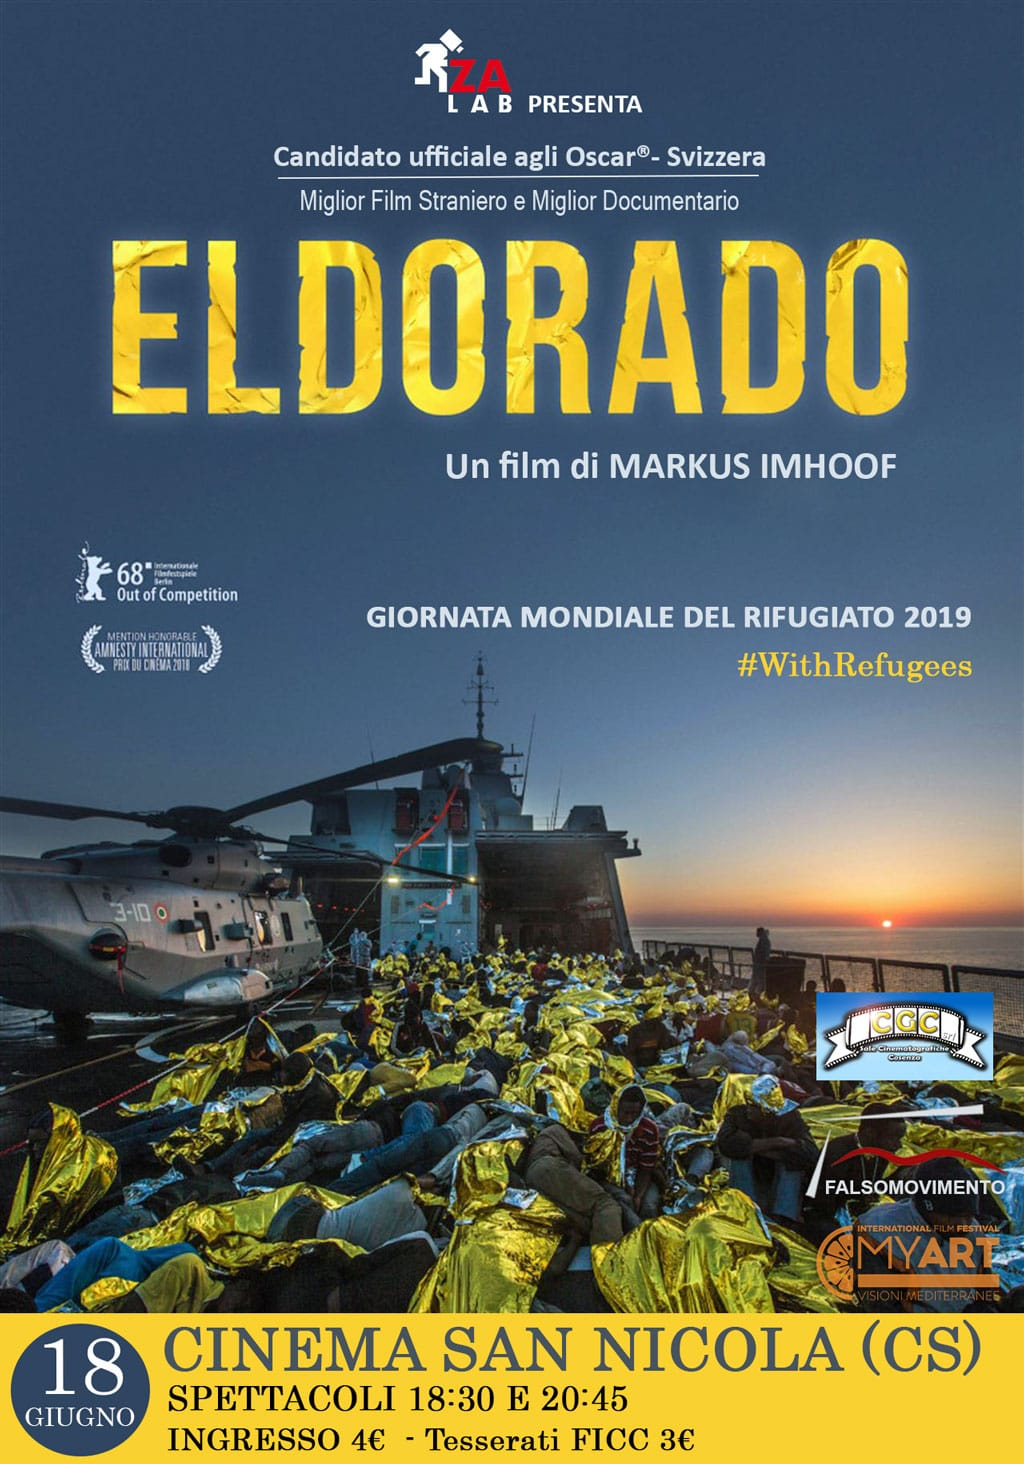 ELDORADO – Un film di MARKUS IMHOOF